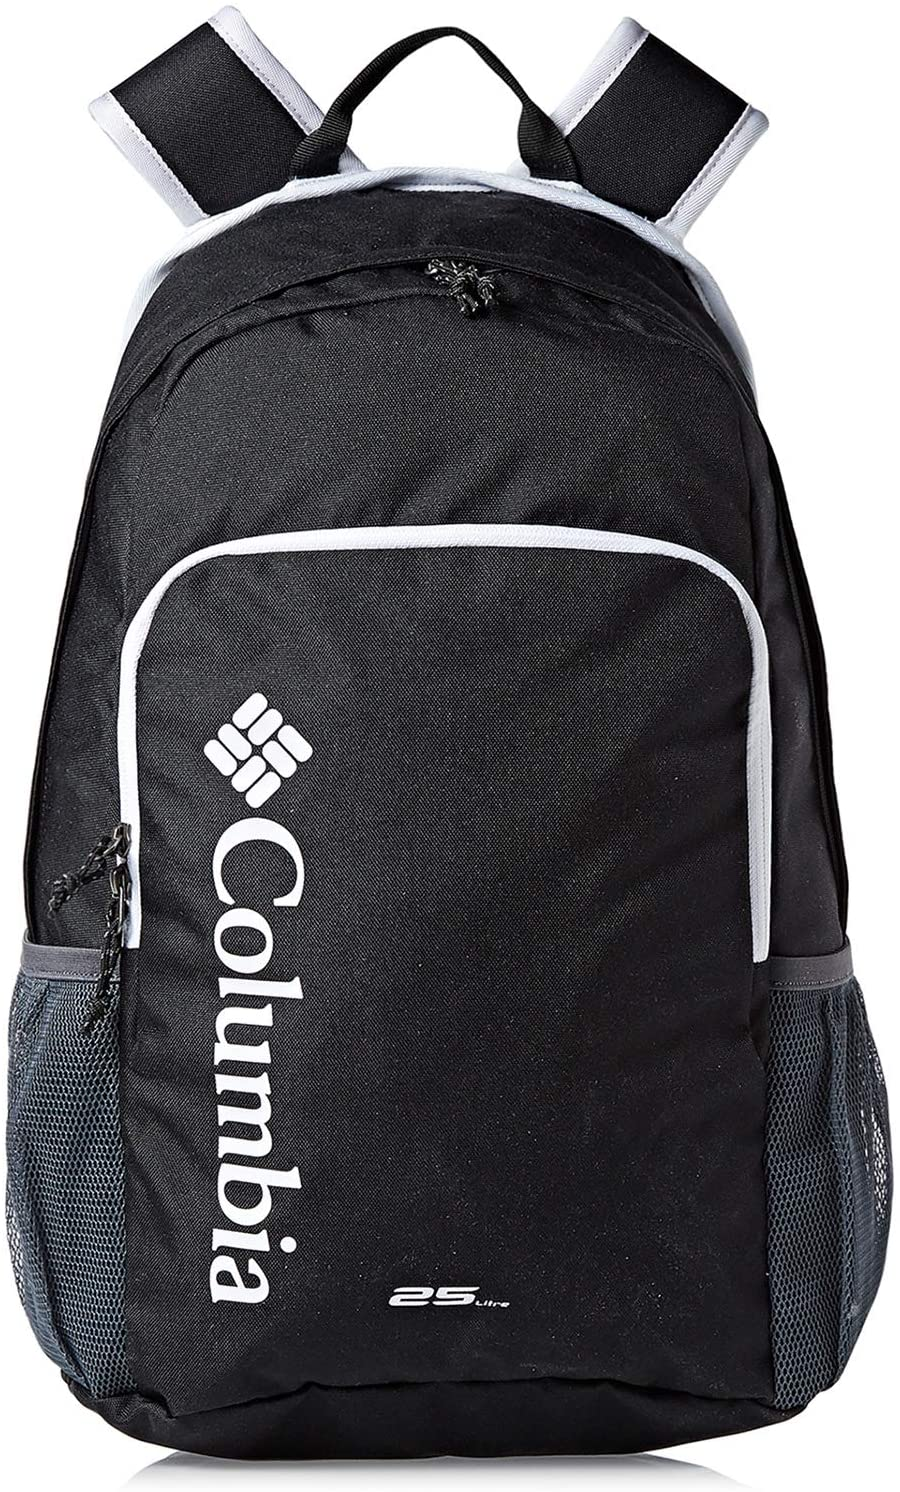 Mochila Richmond 25L Daypack Columbia Sportswear